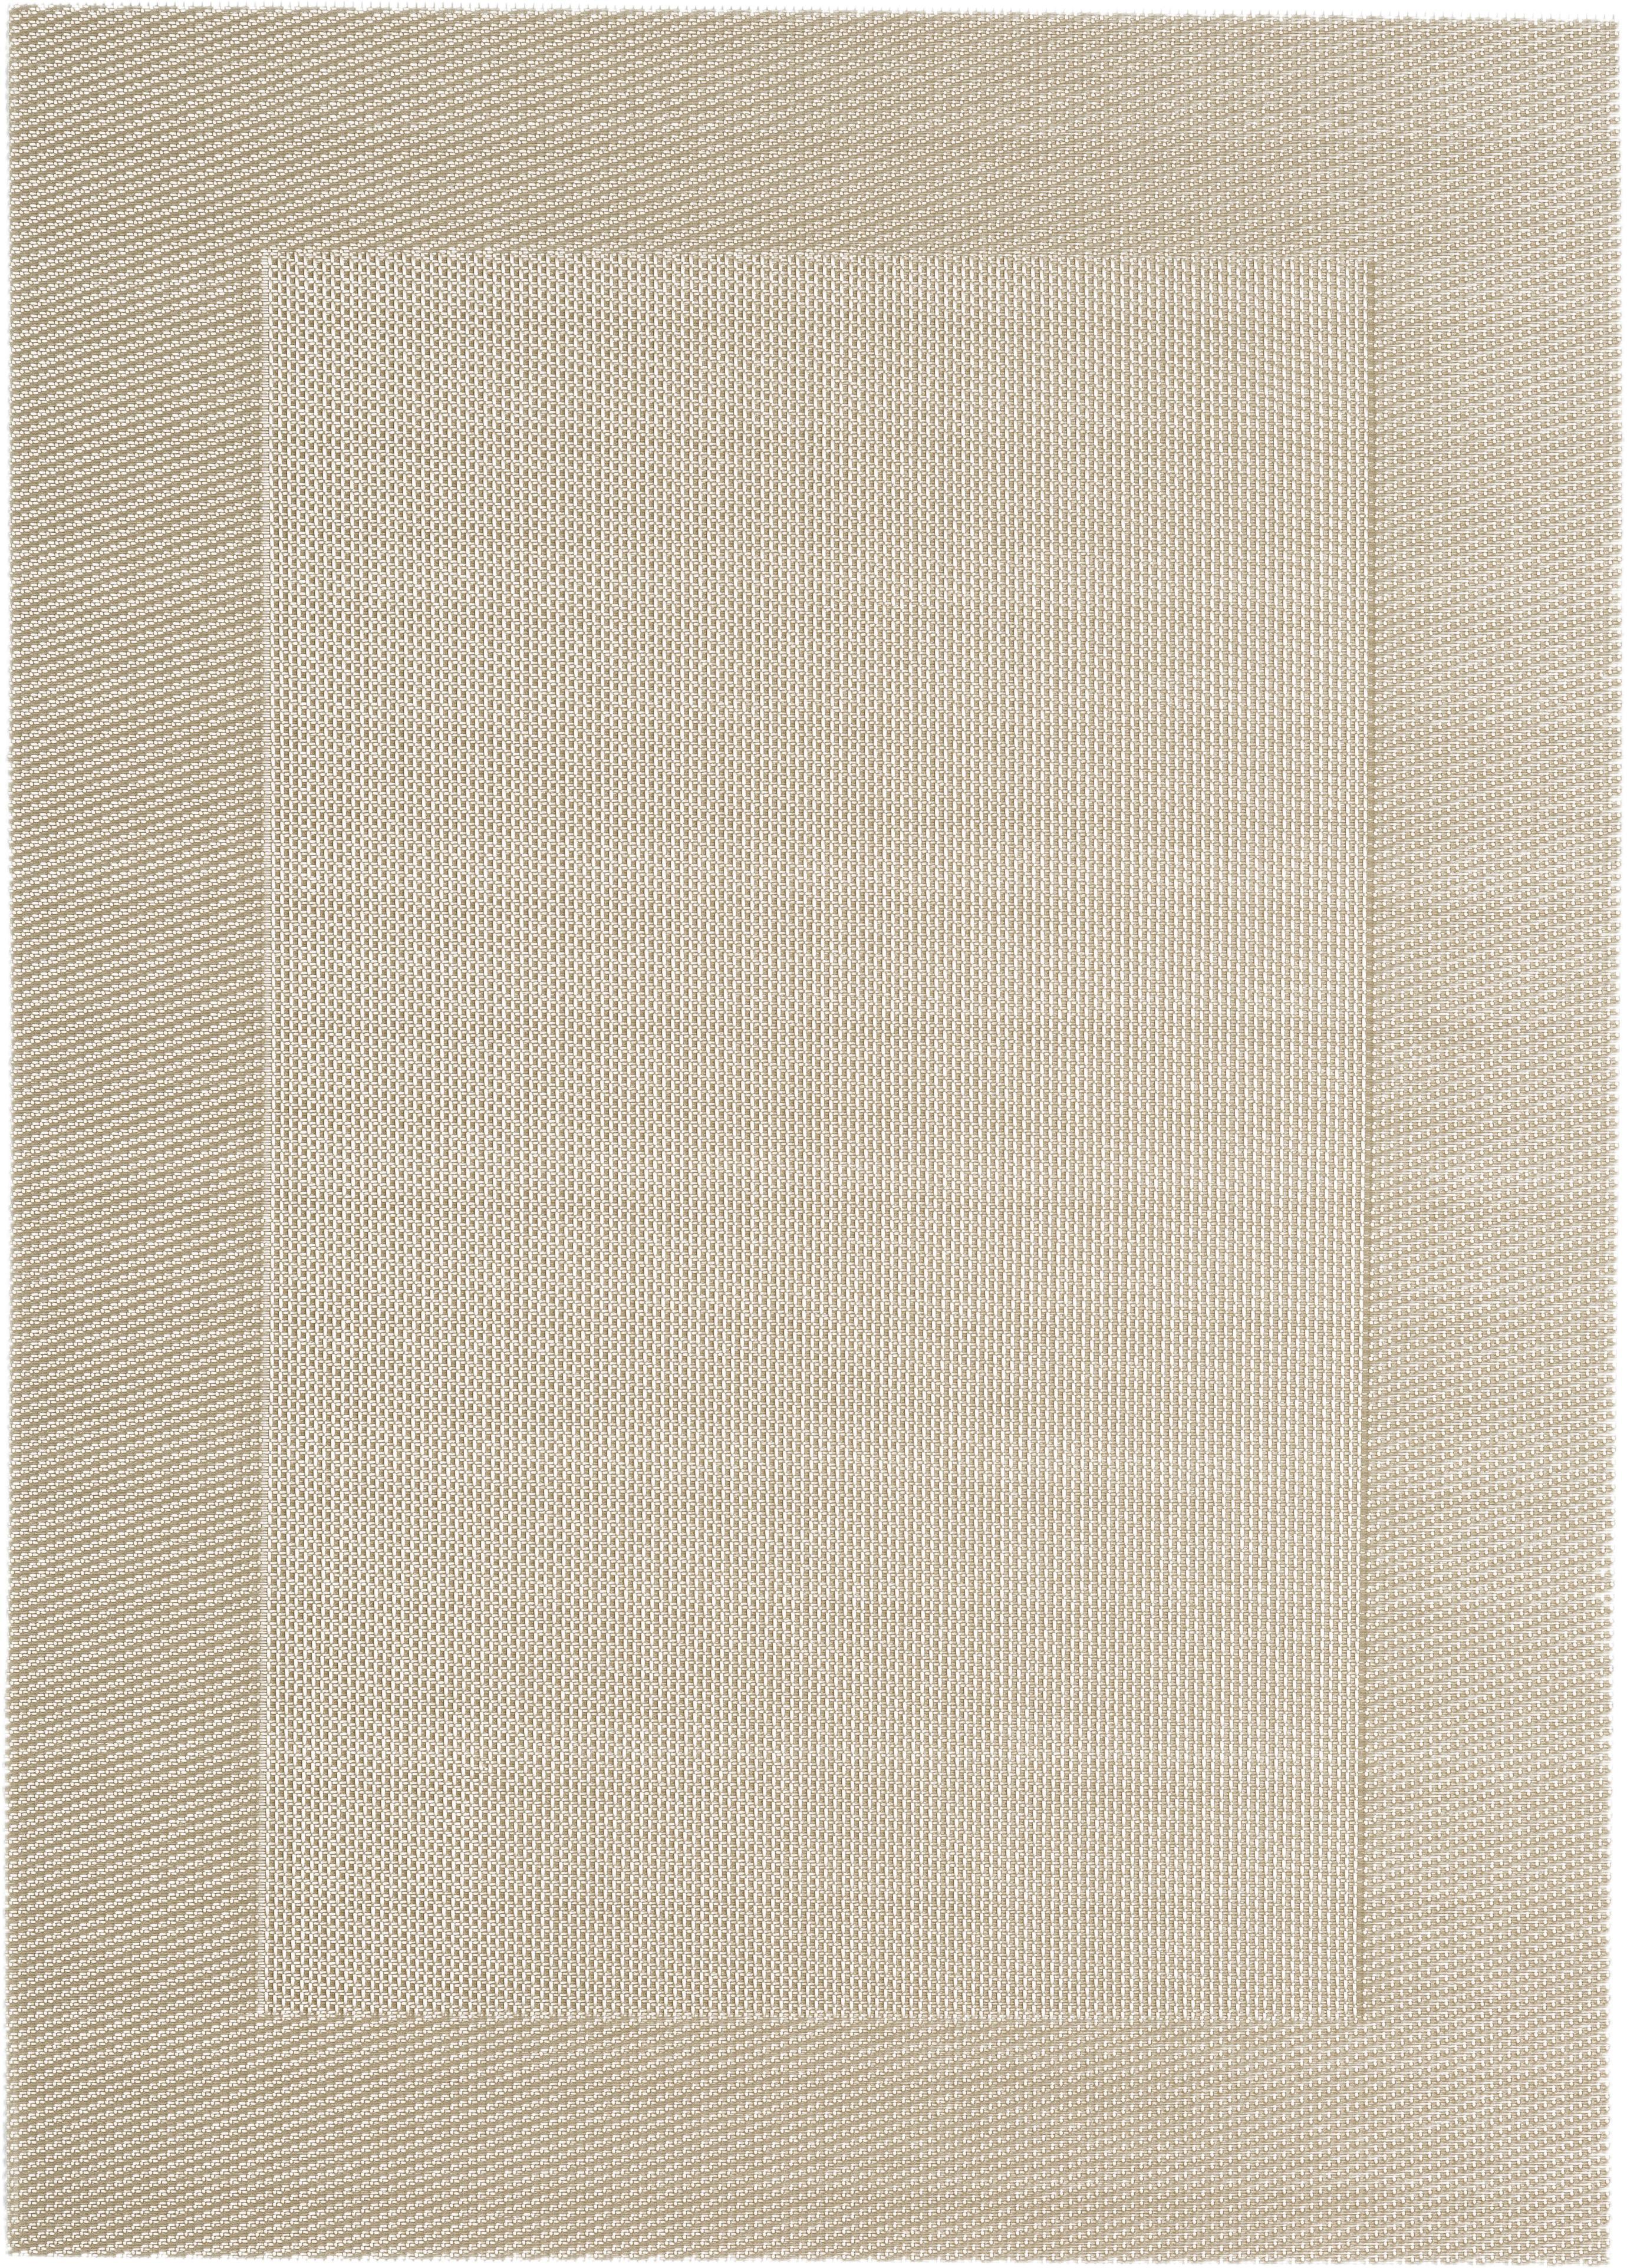 Kunststoff-Tischsets Modern, 2 Stück, Kunststoff, Beige, Creme, 33 x 46 cm